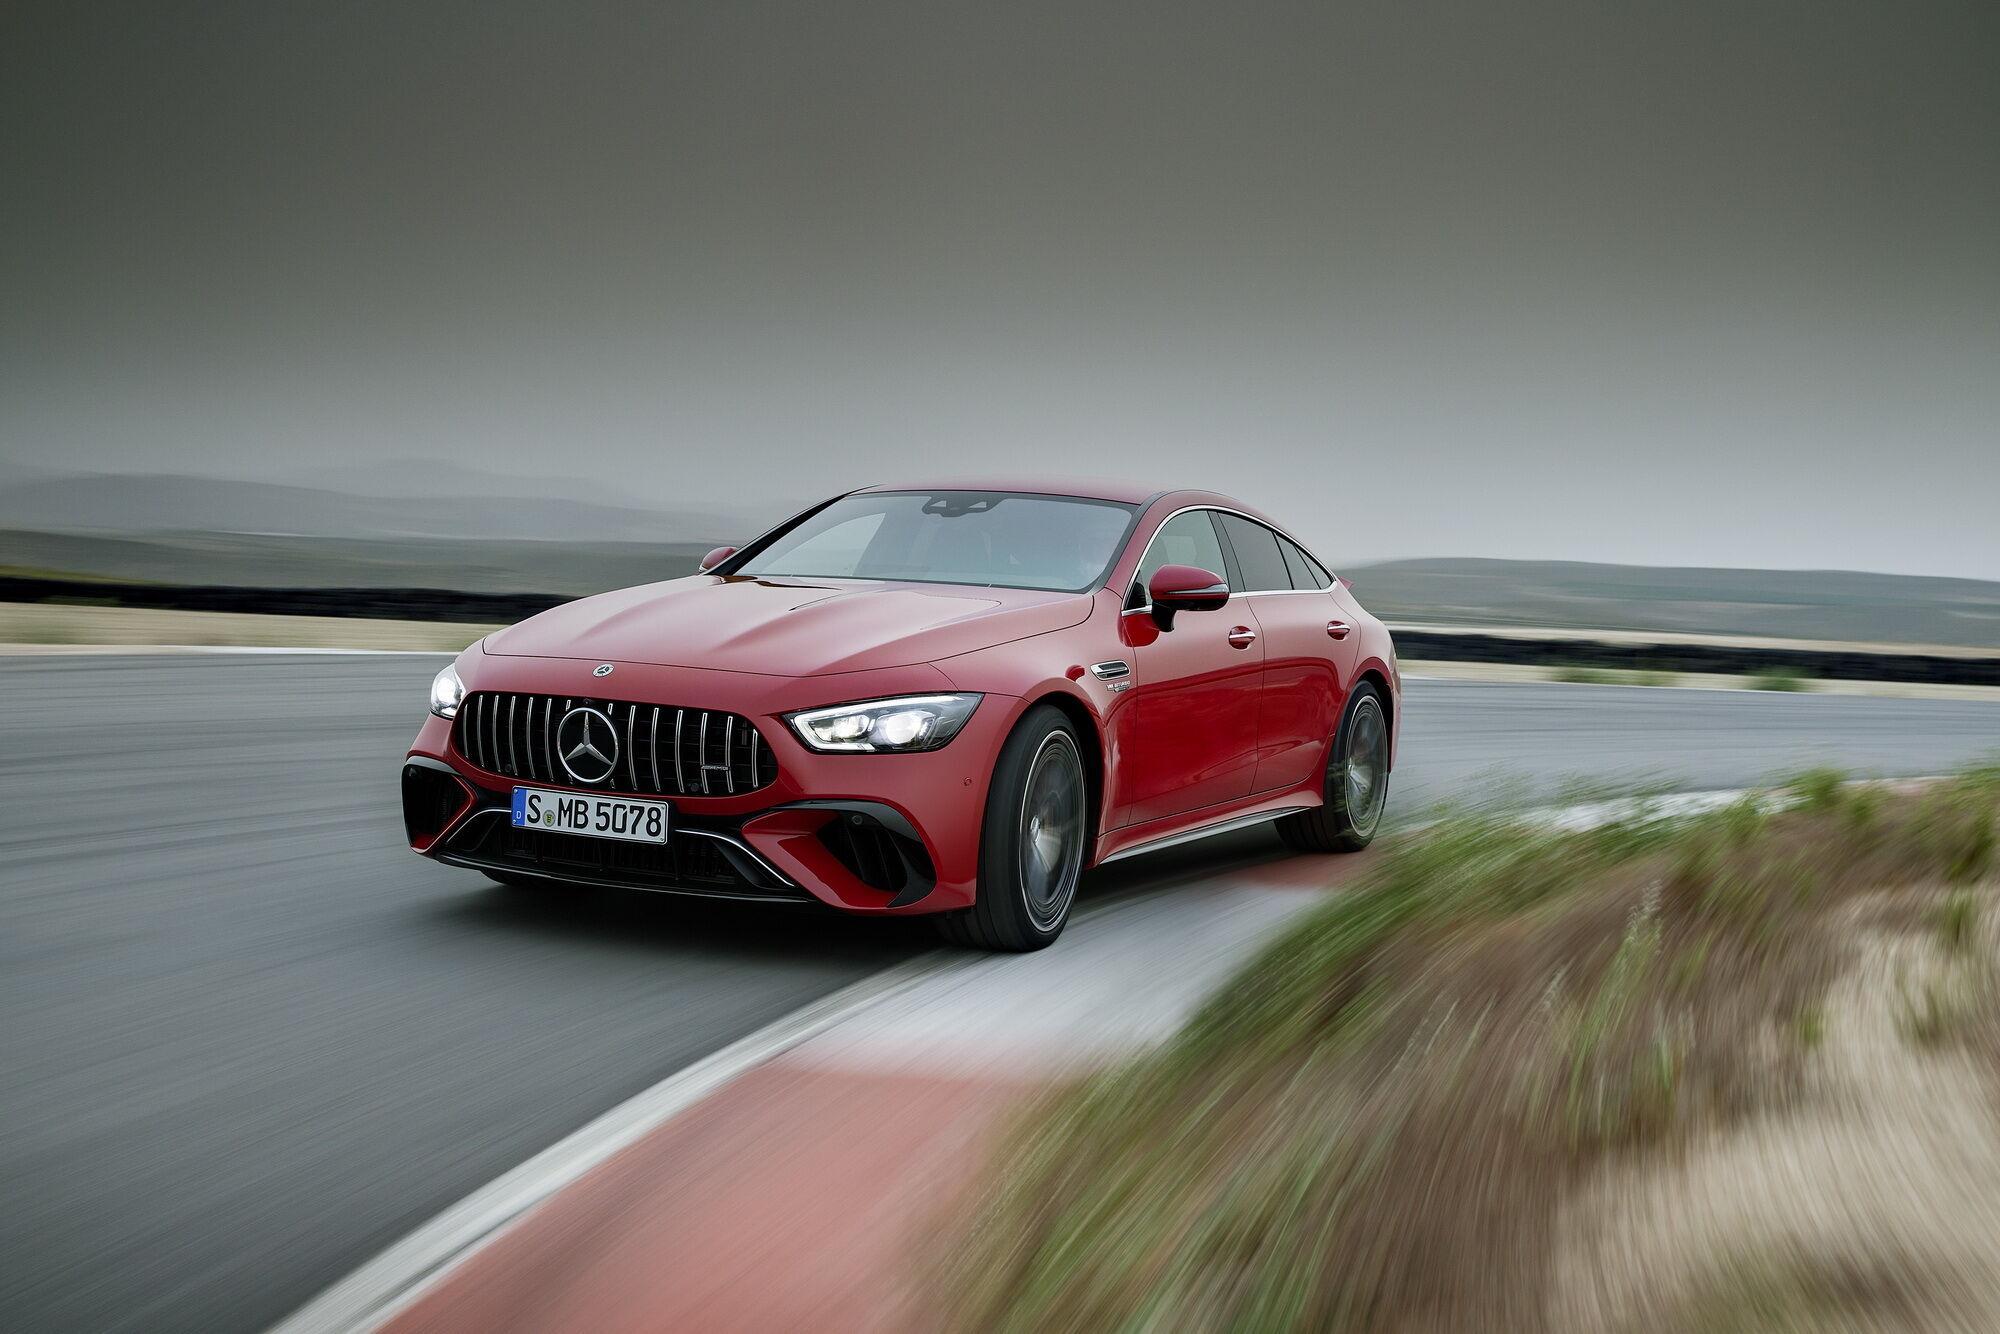 Mercedes-AMG GT 63 SE Performance першим отримав нову гібридну установку E Performance